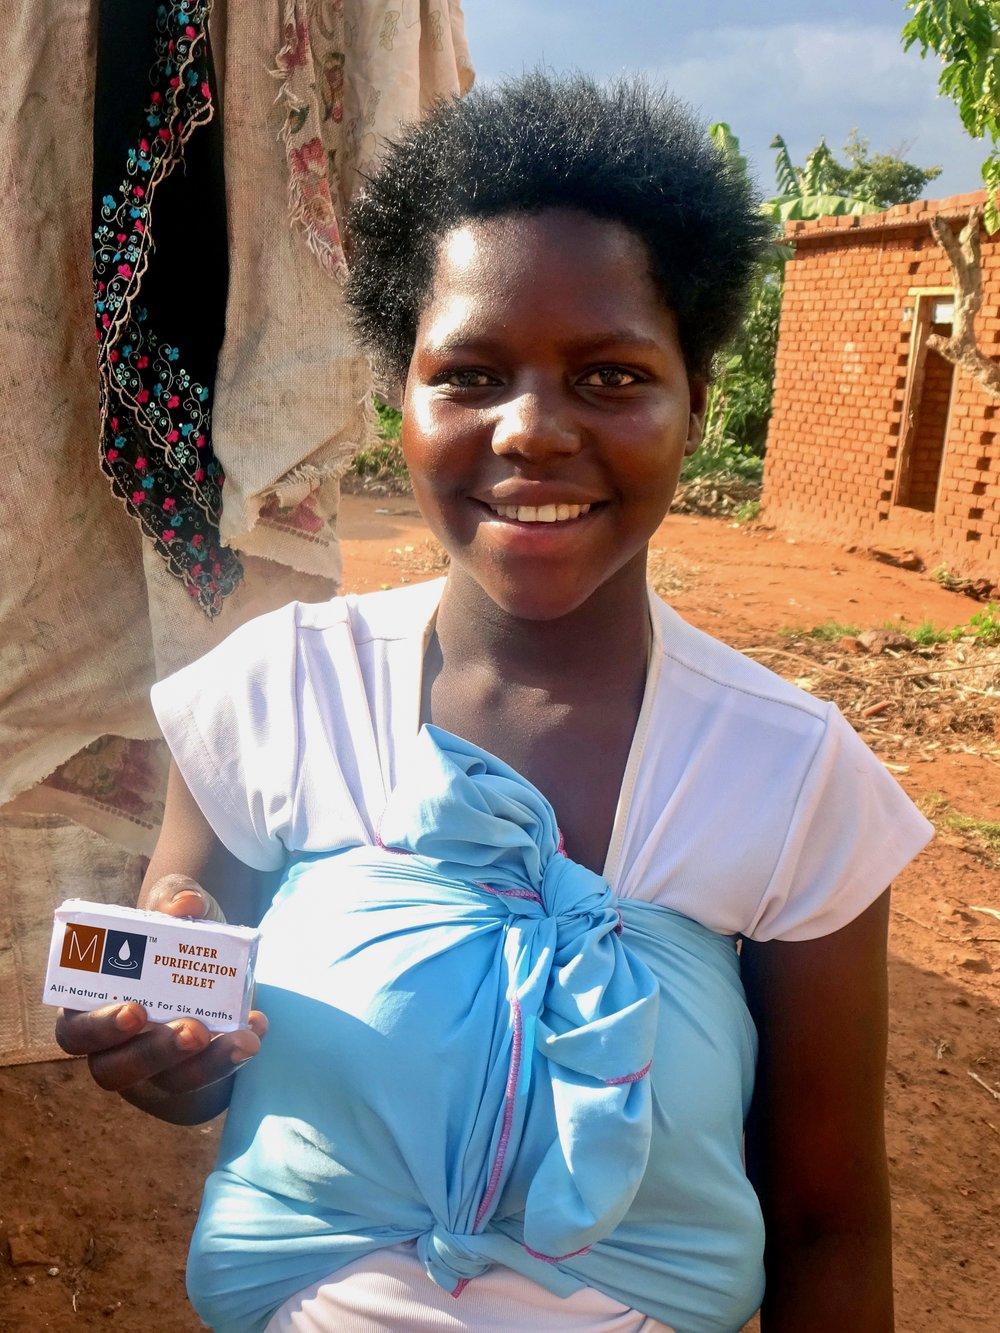 Africa_Uganda_Whave16.jpg